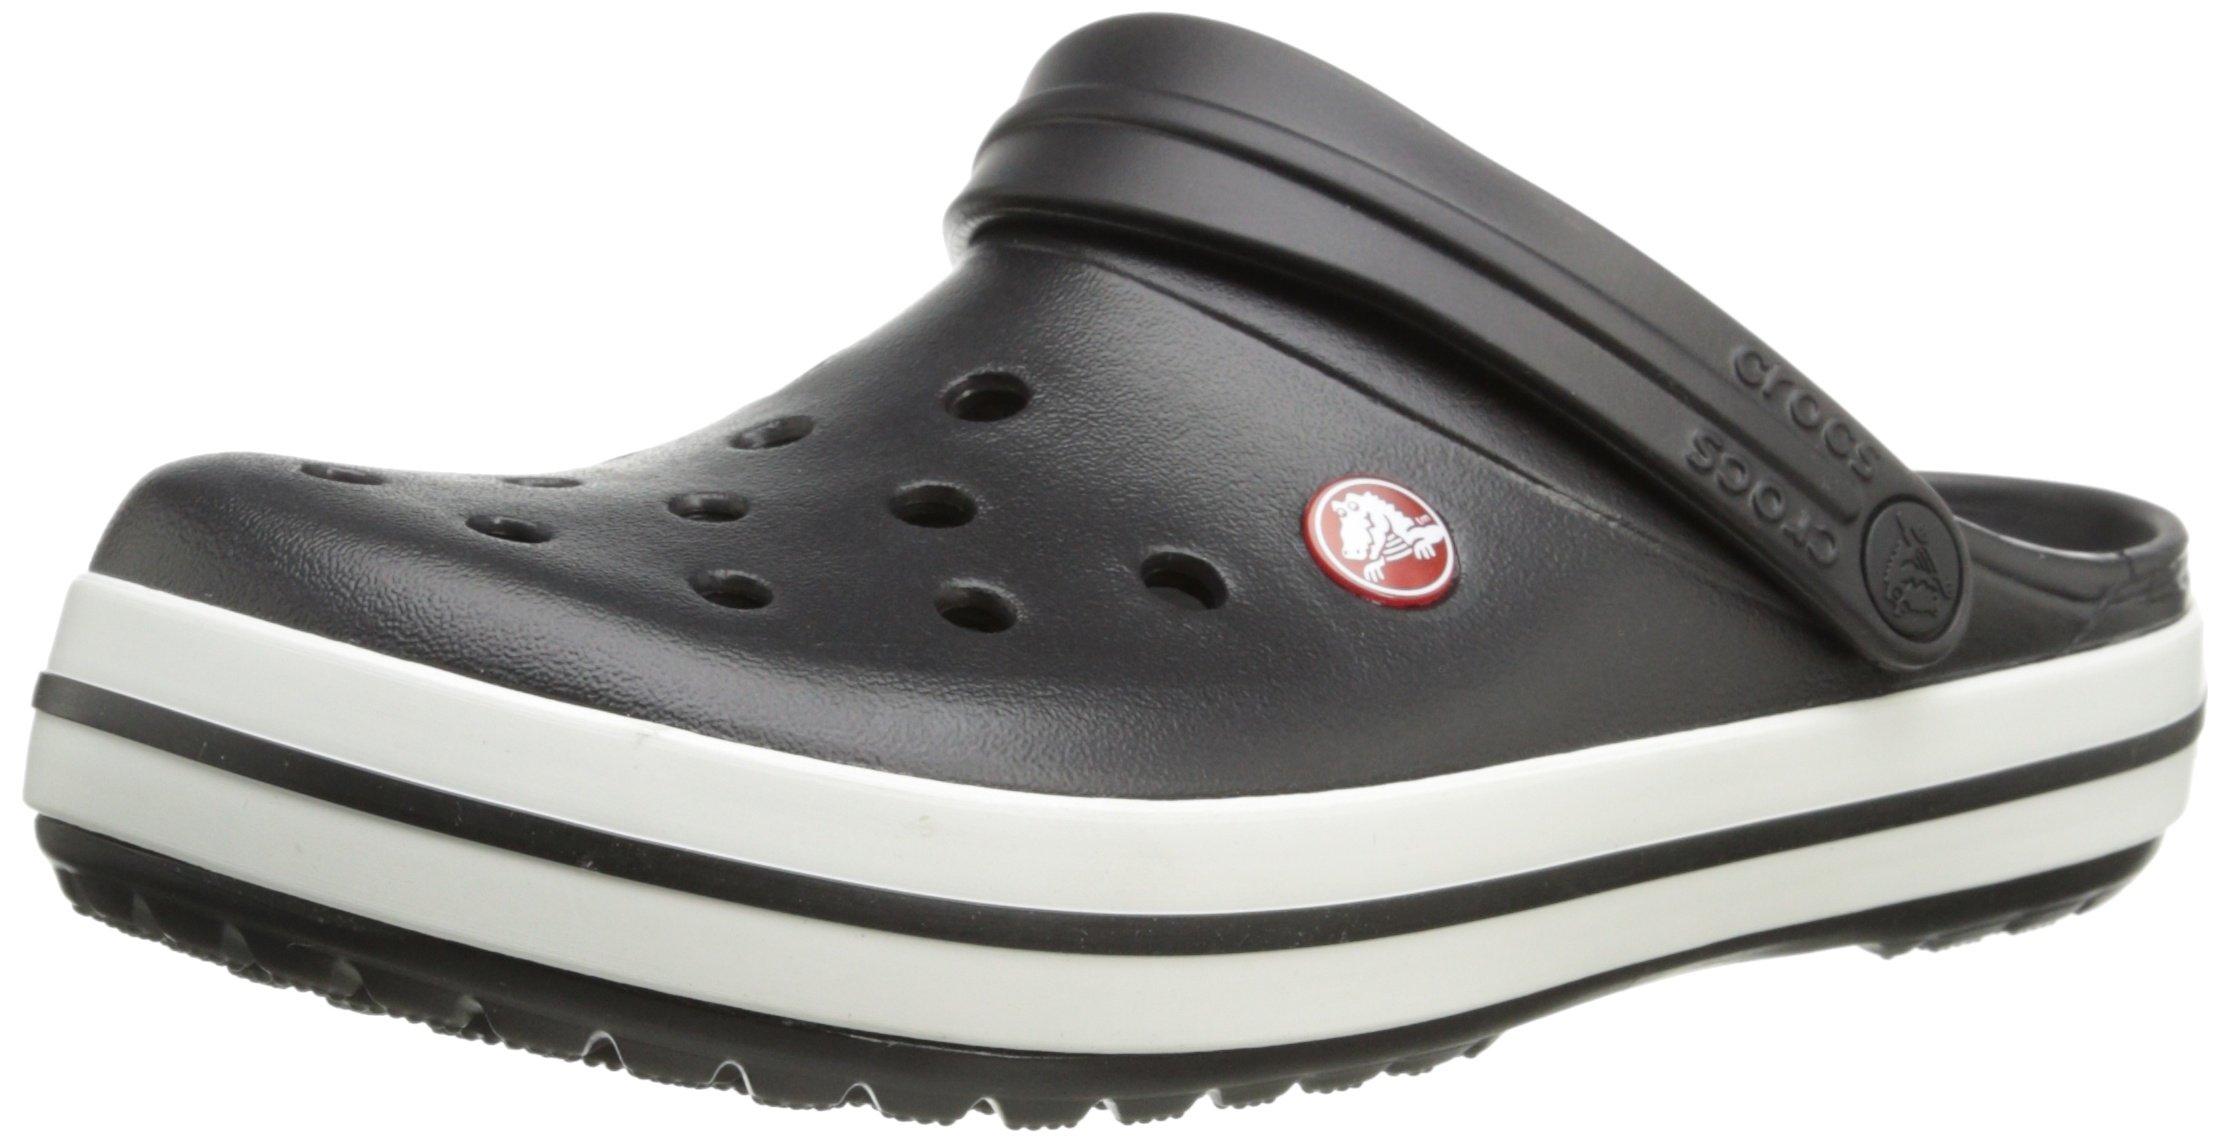 Crocs Unisex Crocband Clog, Black, 12 US Men / 14 US Women by Crocs